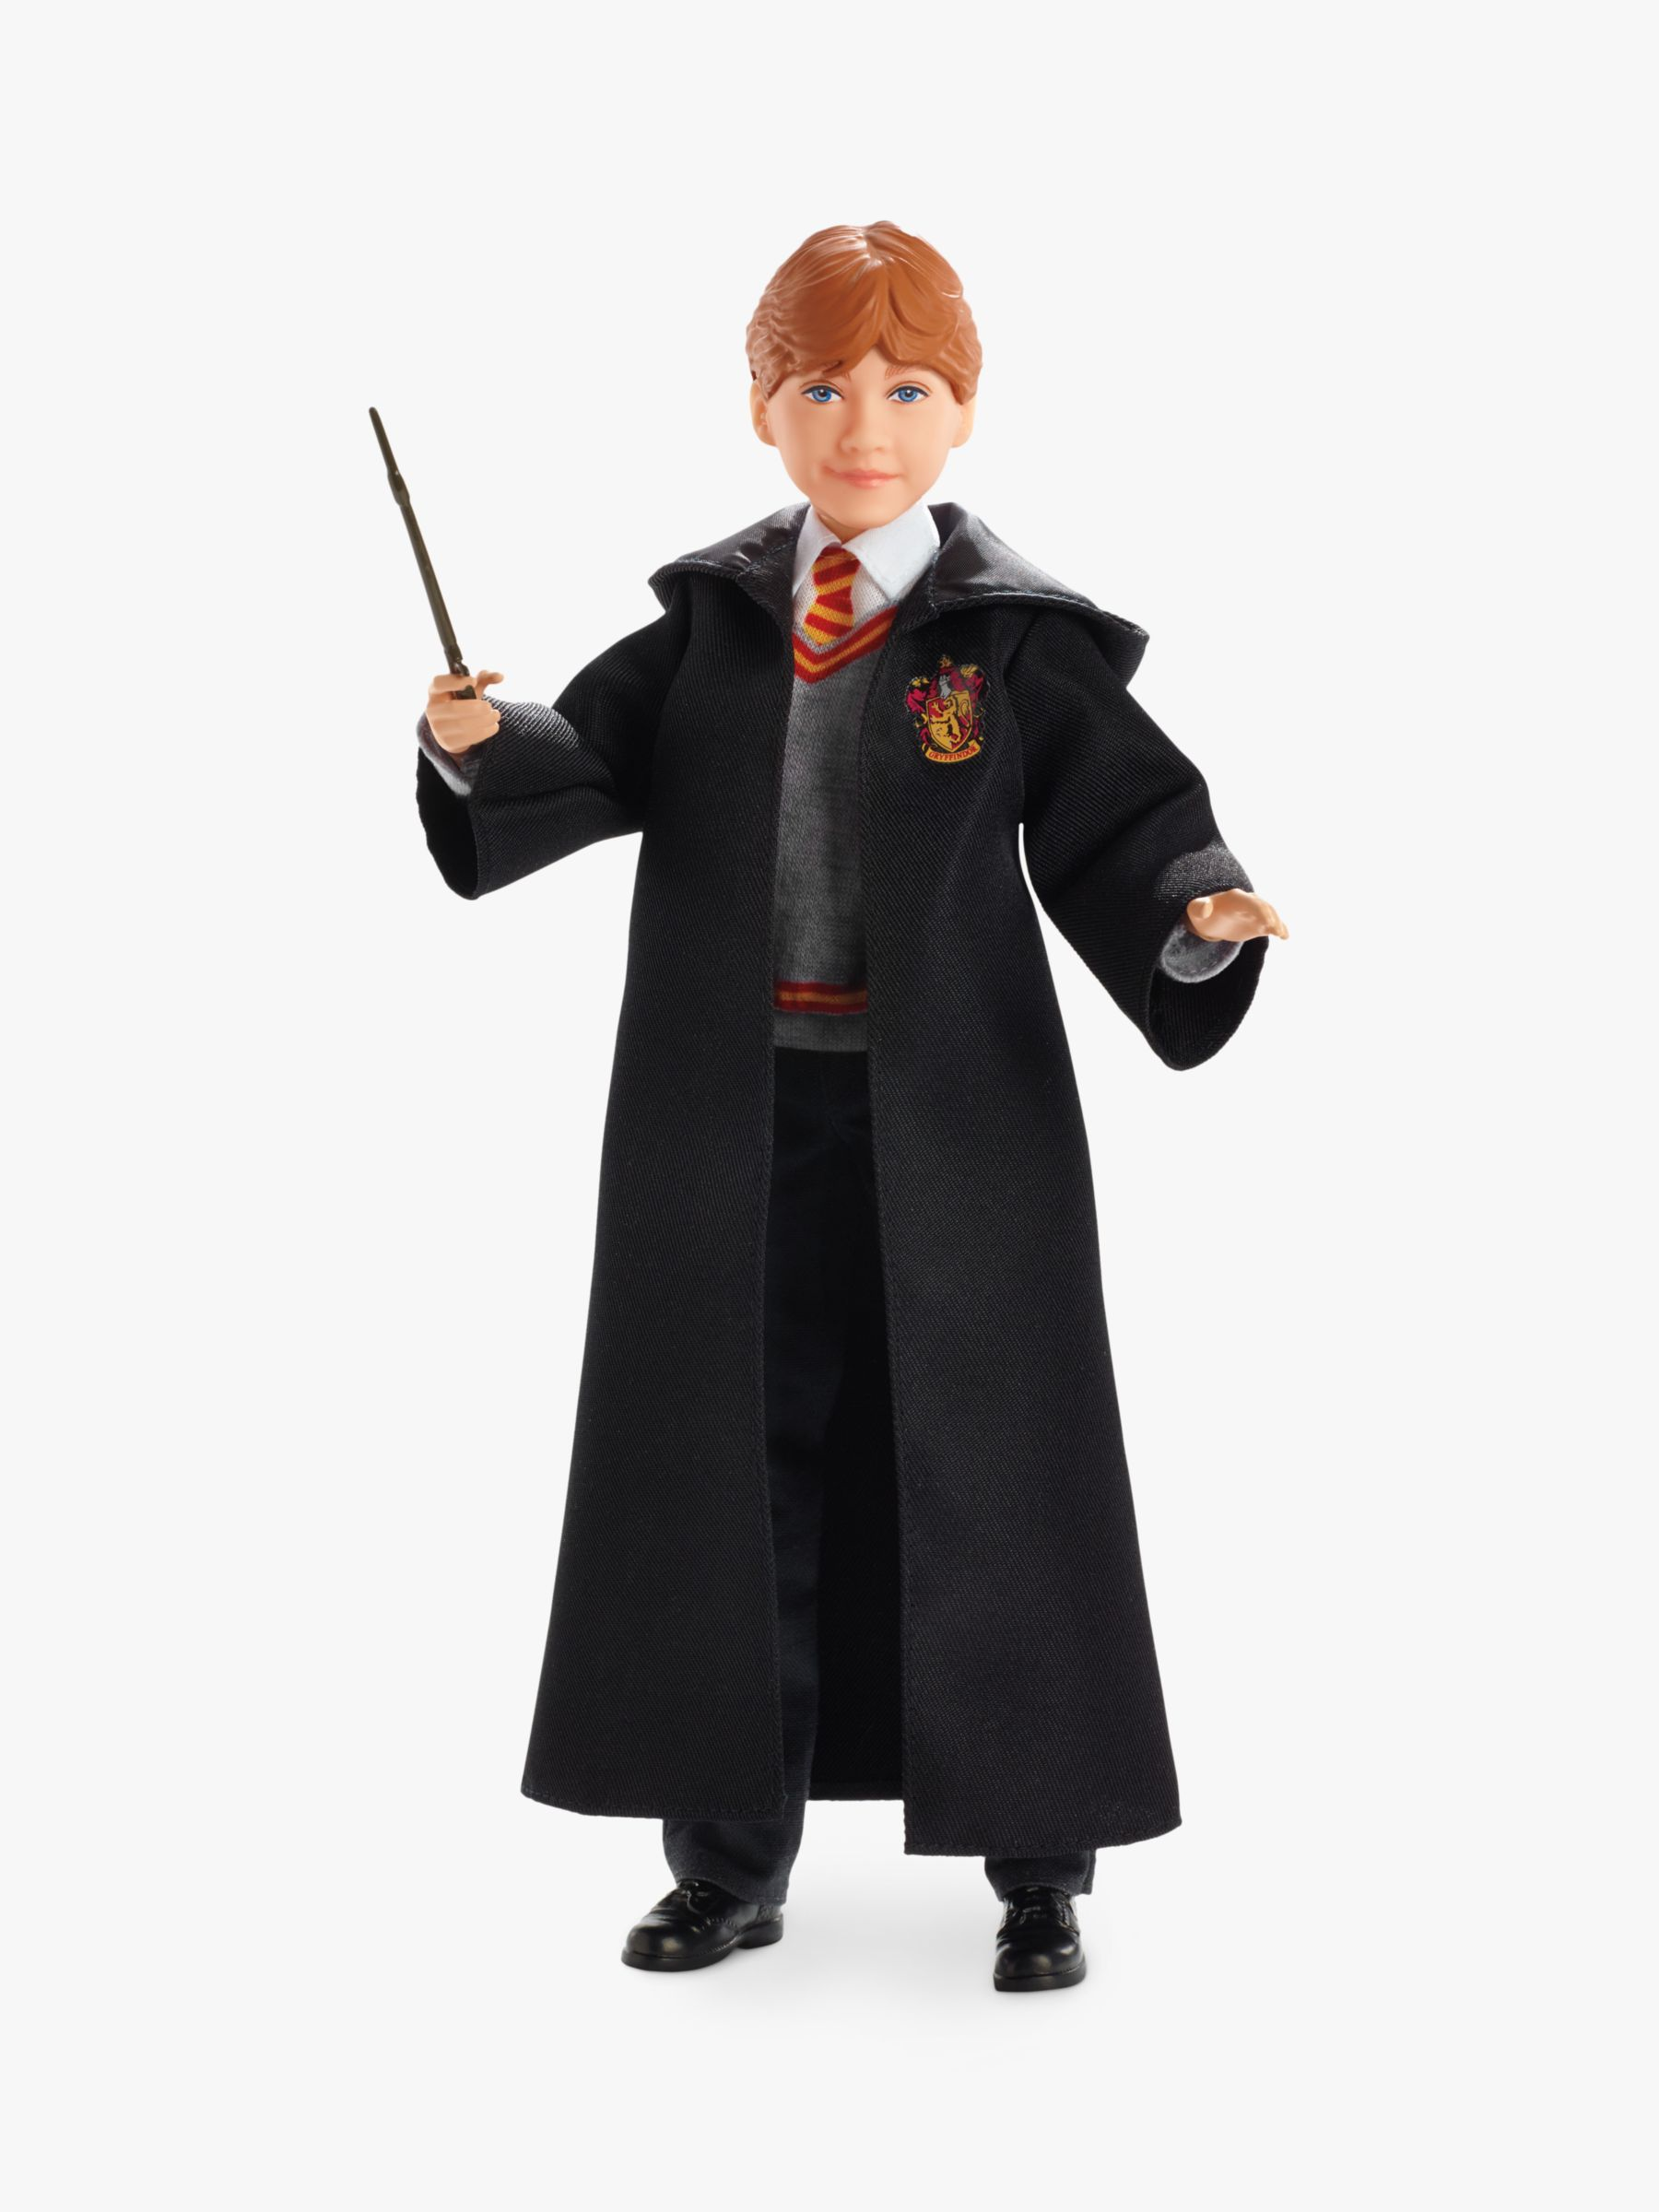 Harry Potter Harry Potter Ron Weasley Action Figure